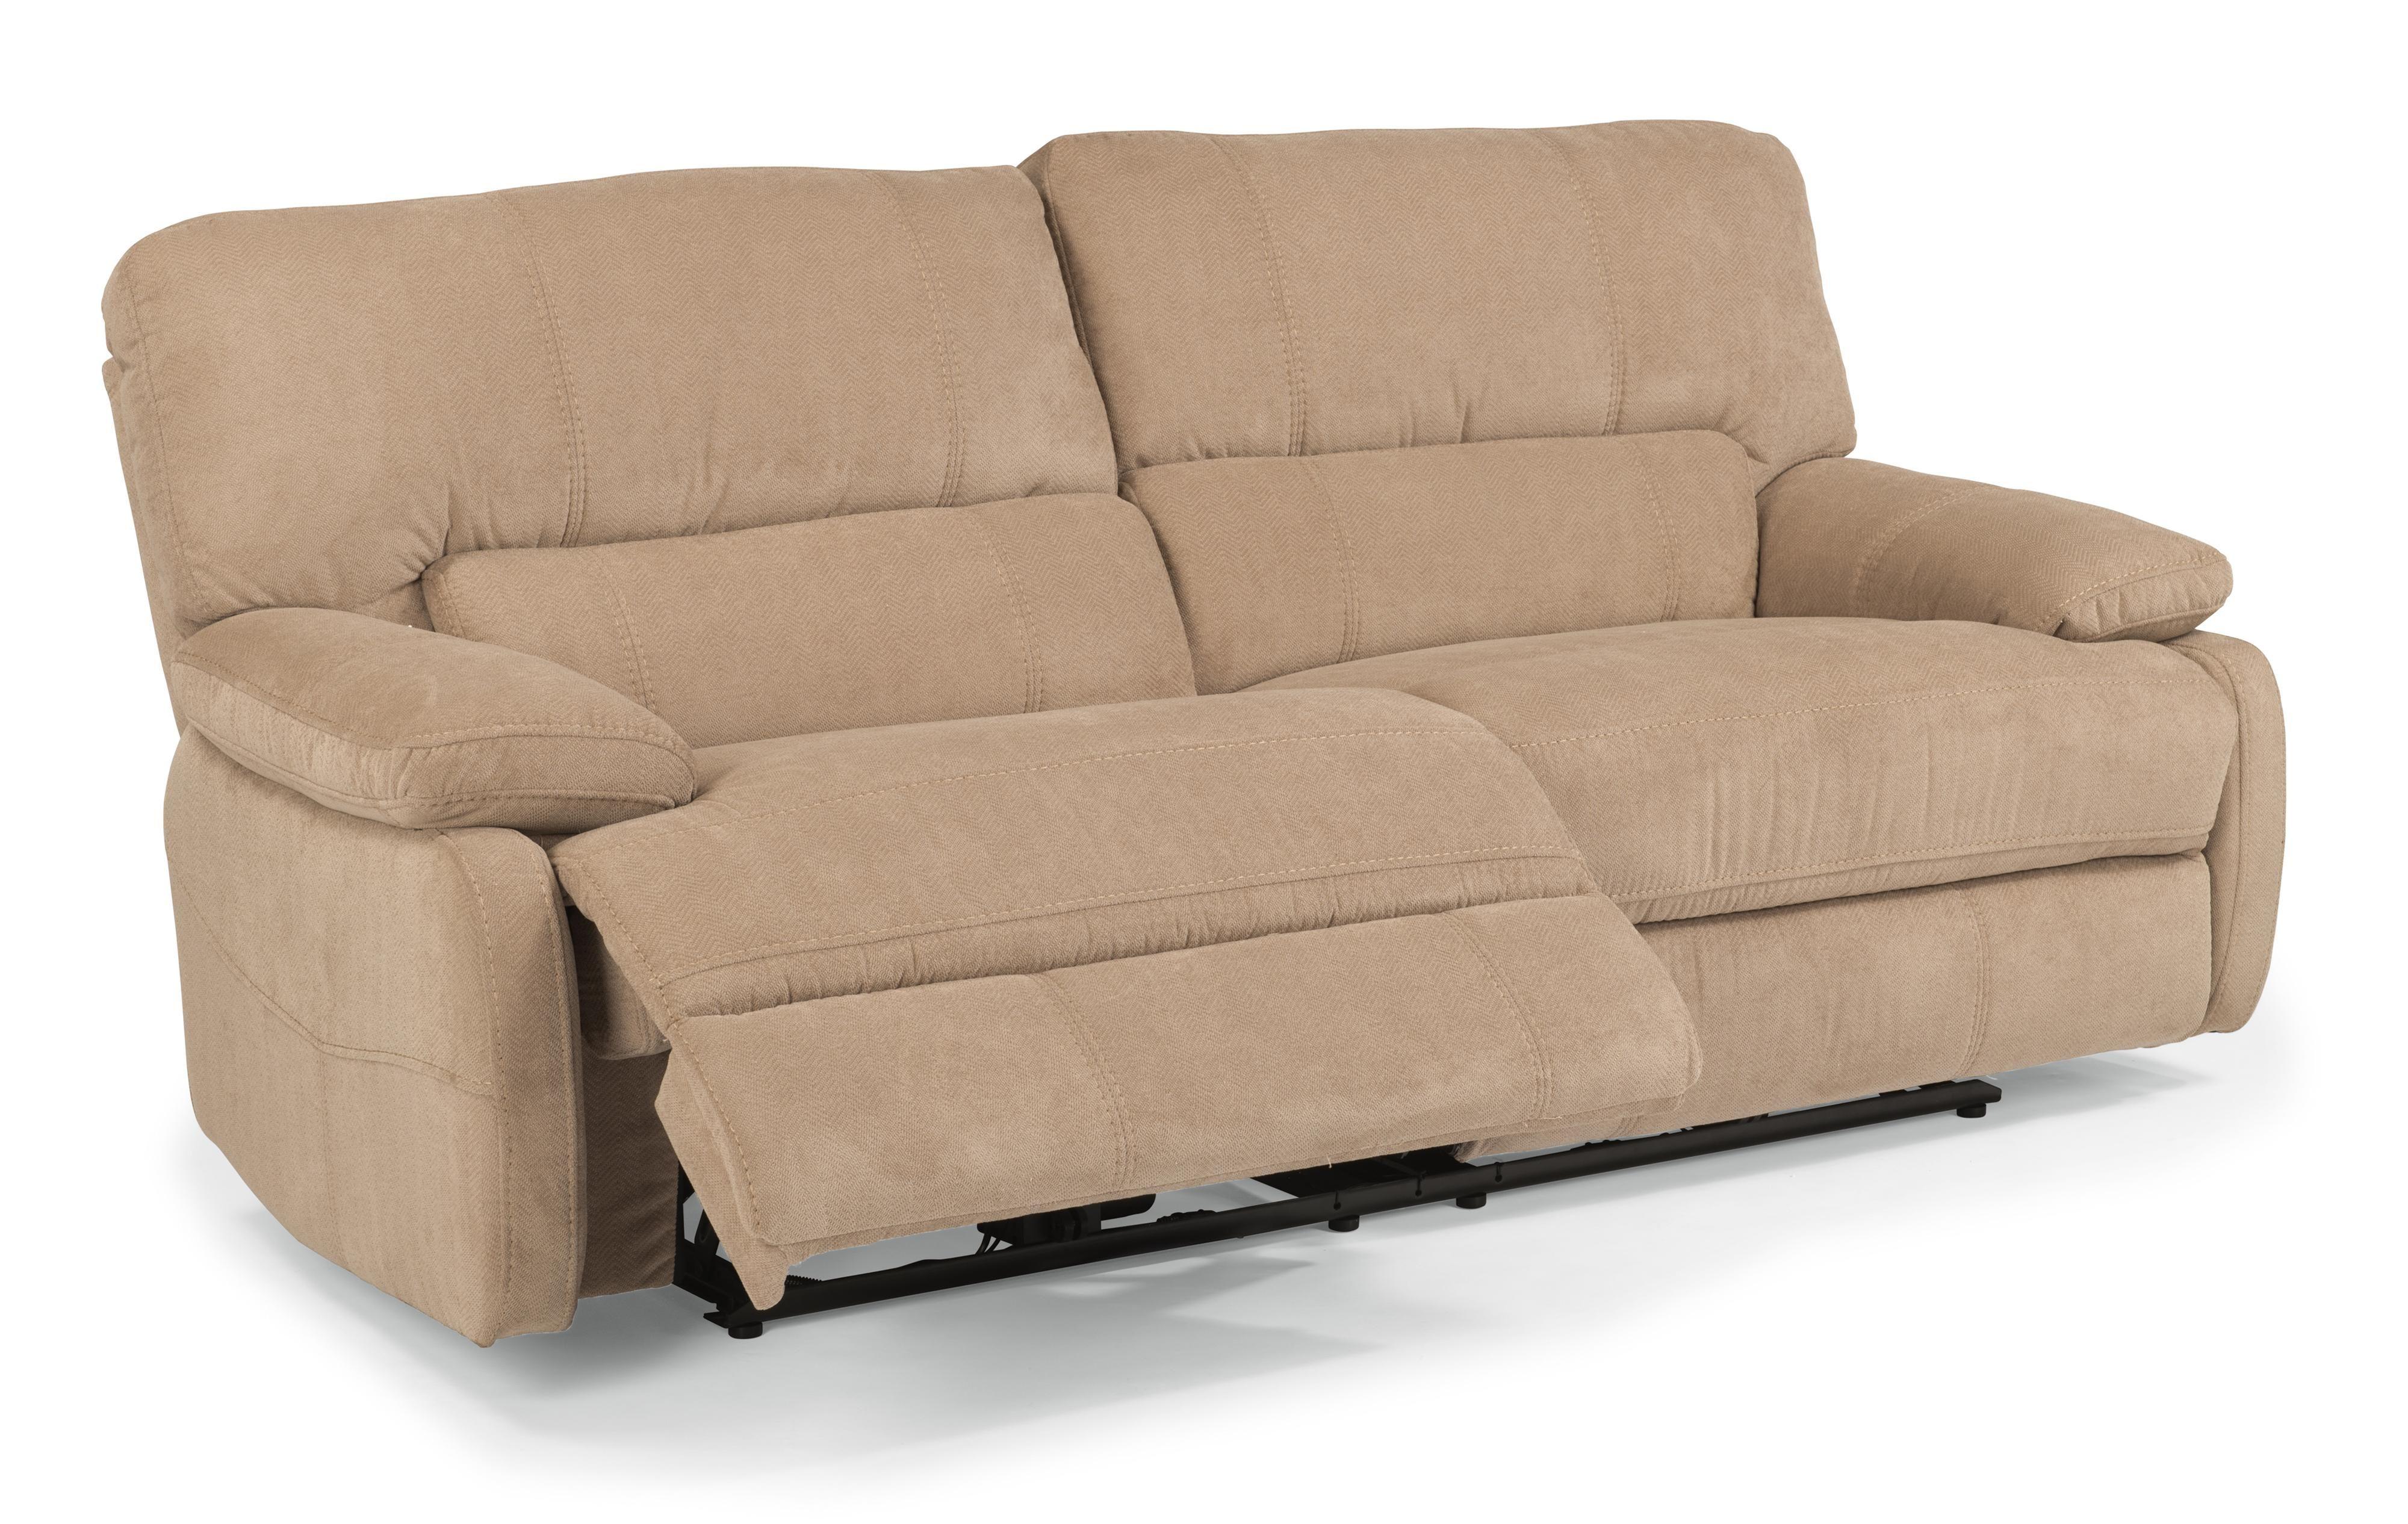 Latitudes Layla Power Reclining Sofa By Flexsteel New